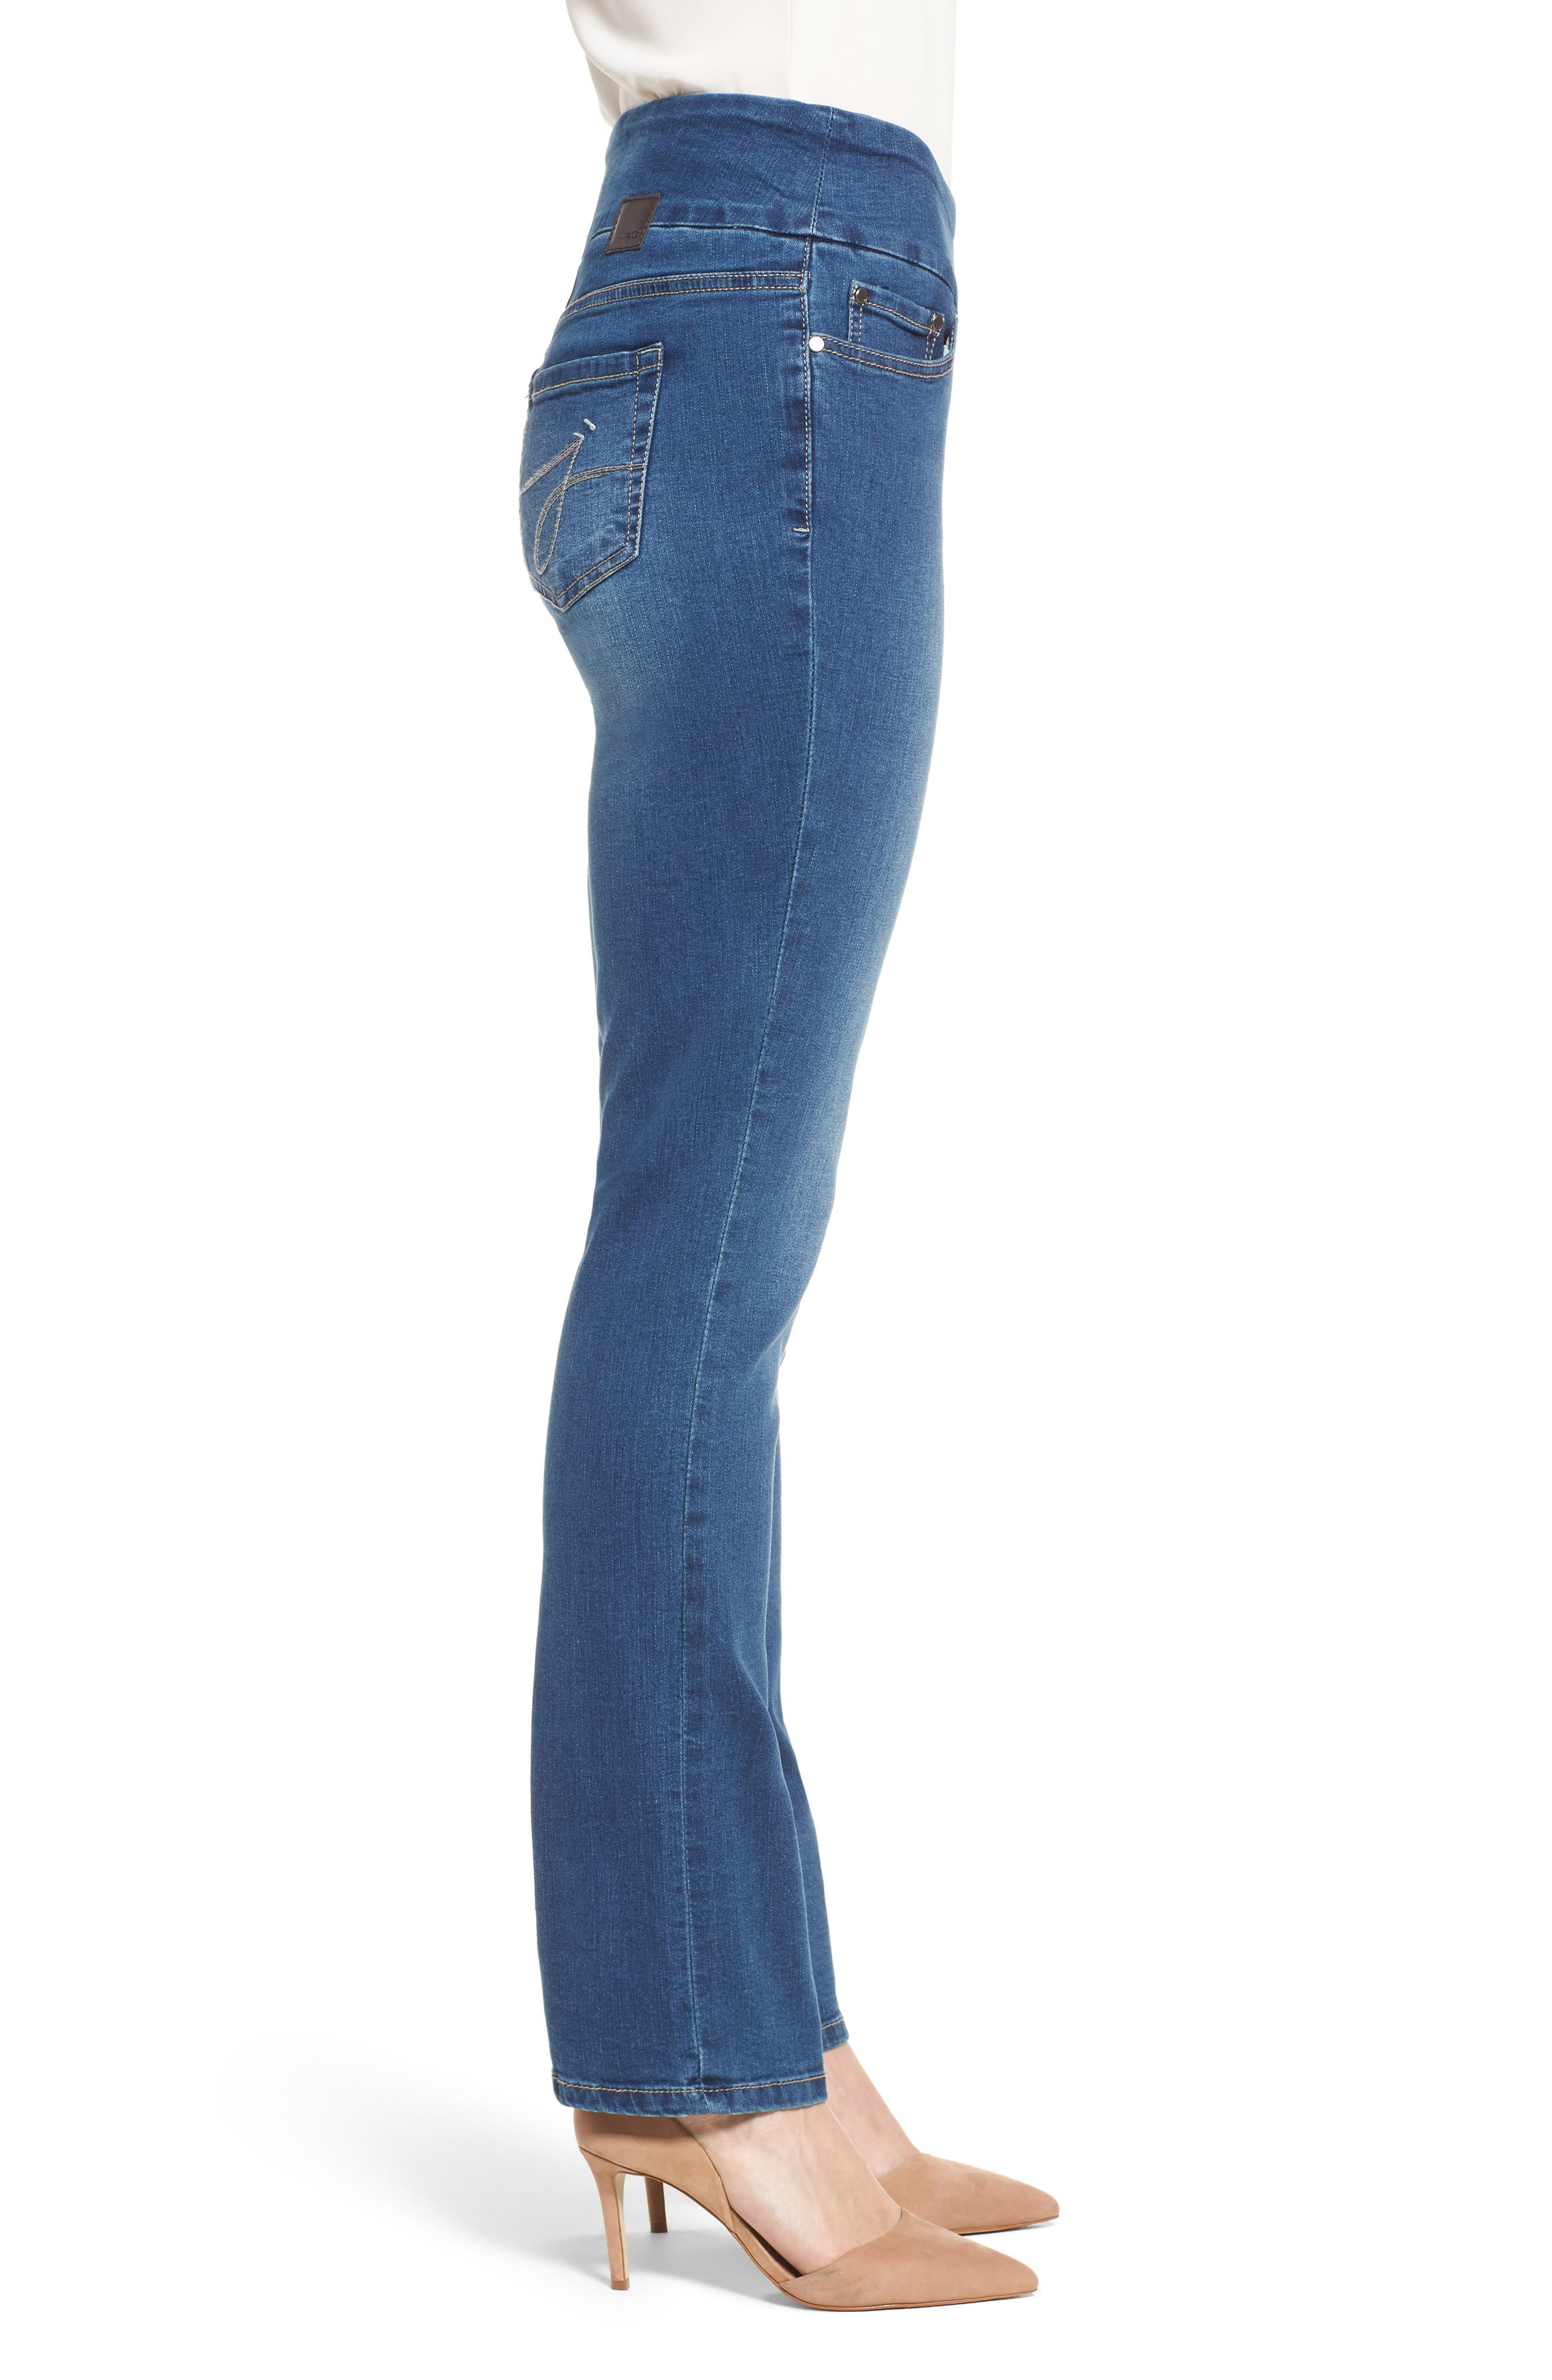 JAG JEANS, Peri Pull-On Straight Leg Jeans, Alternate thumbnail 3, color, MEDIUM INDIGO